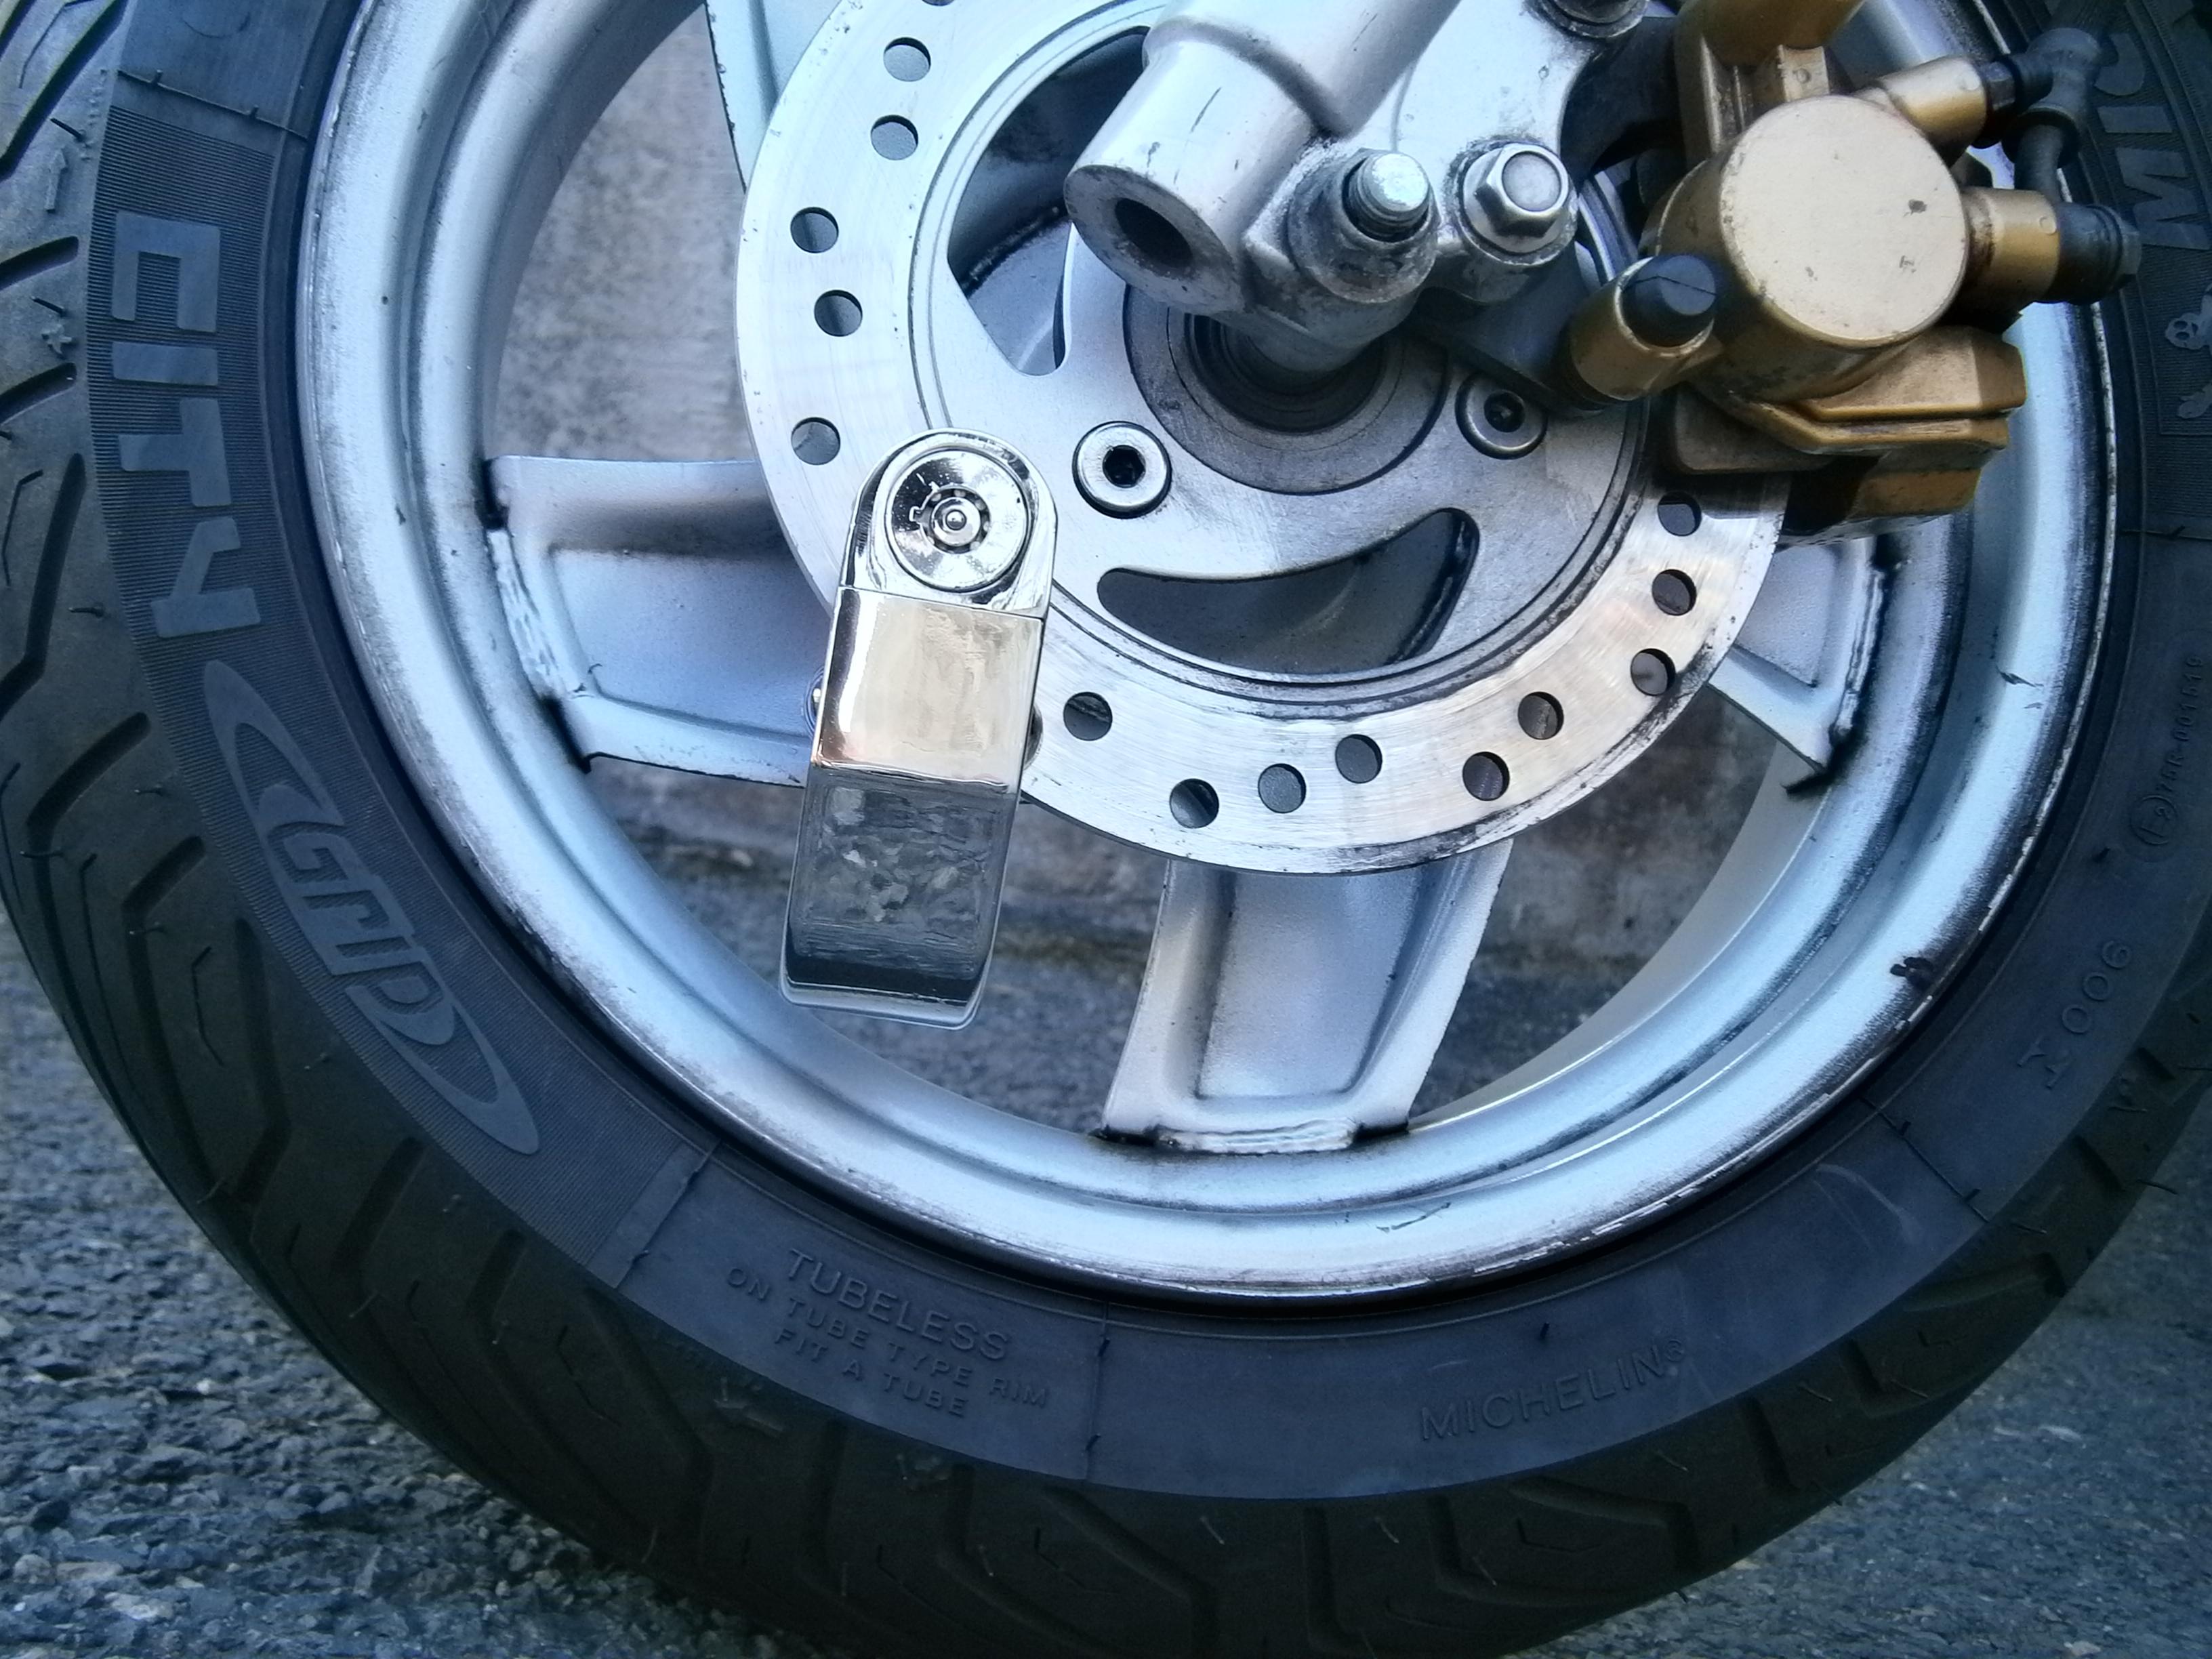 ocelovy zamek na motorku / kolo